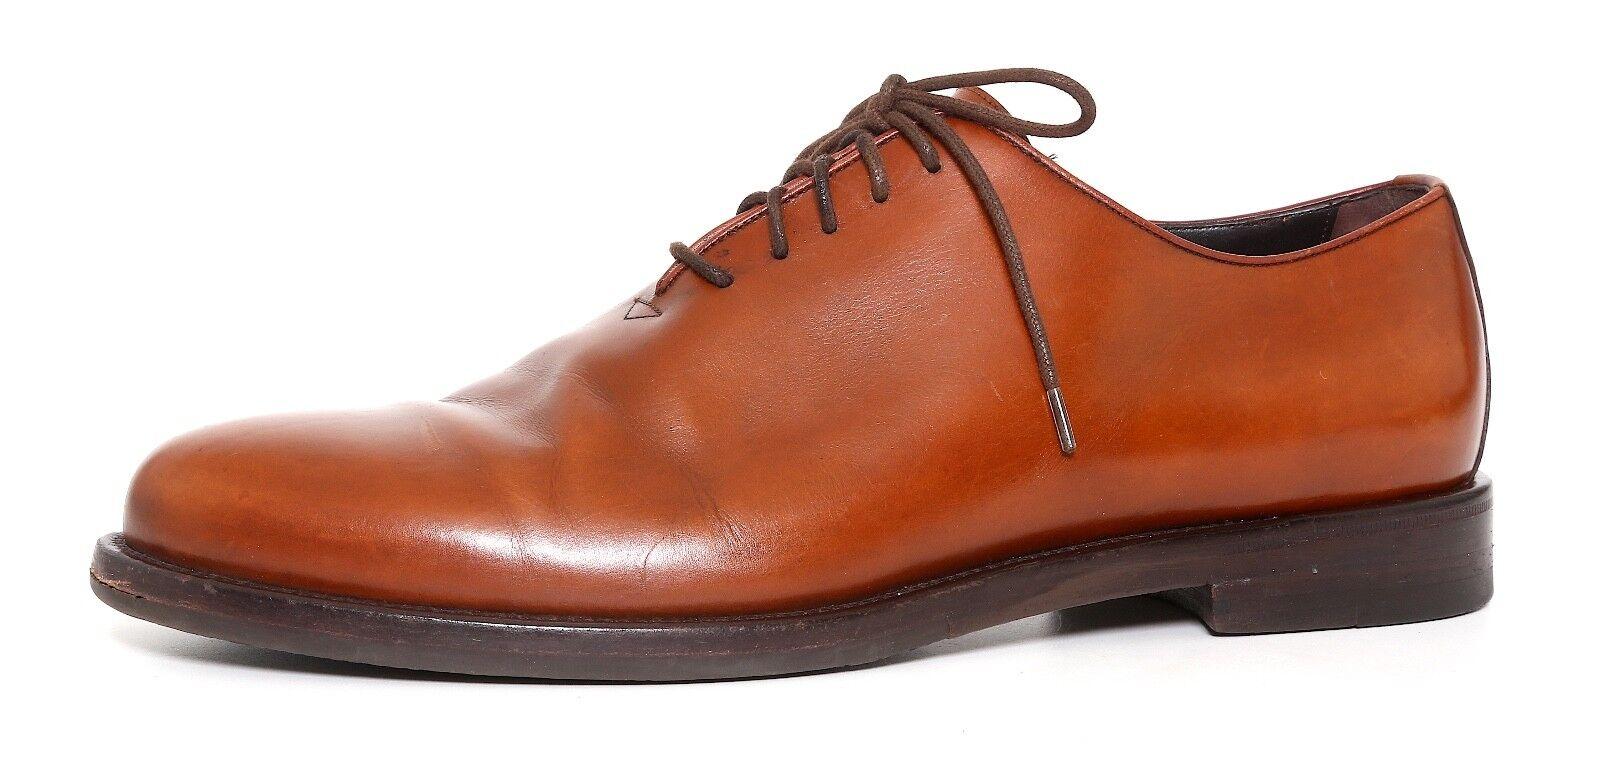 Giorgio Armani Lace Up Leather Oxfords Brown Men Sz 43.5 EUR 1170